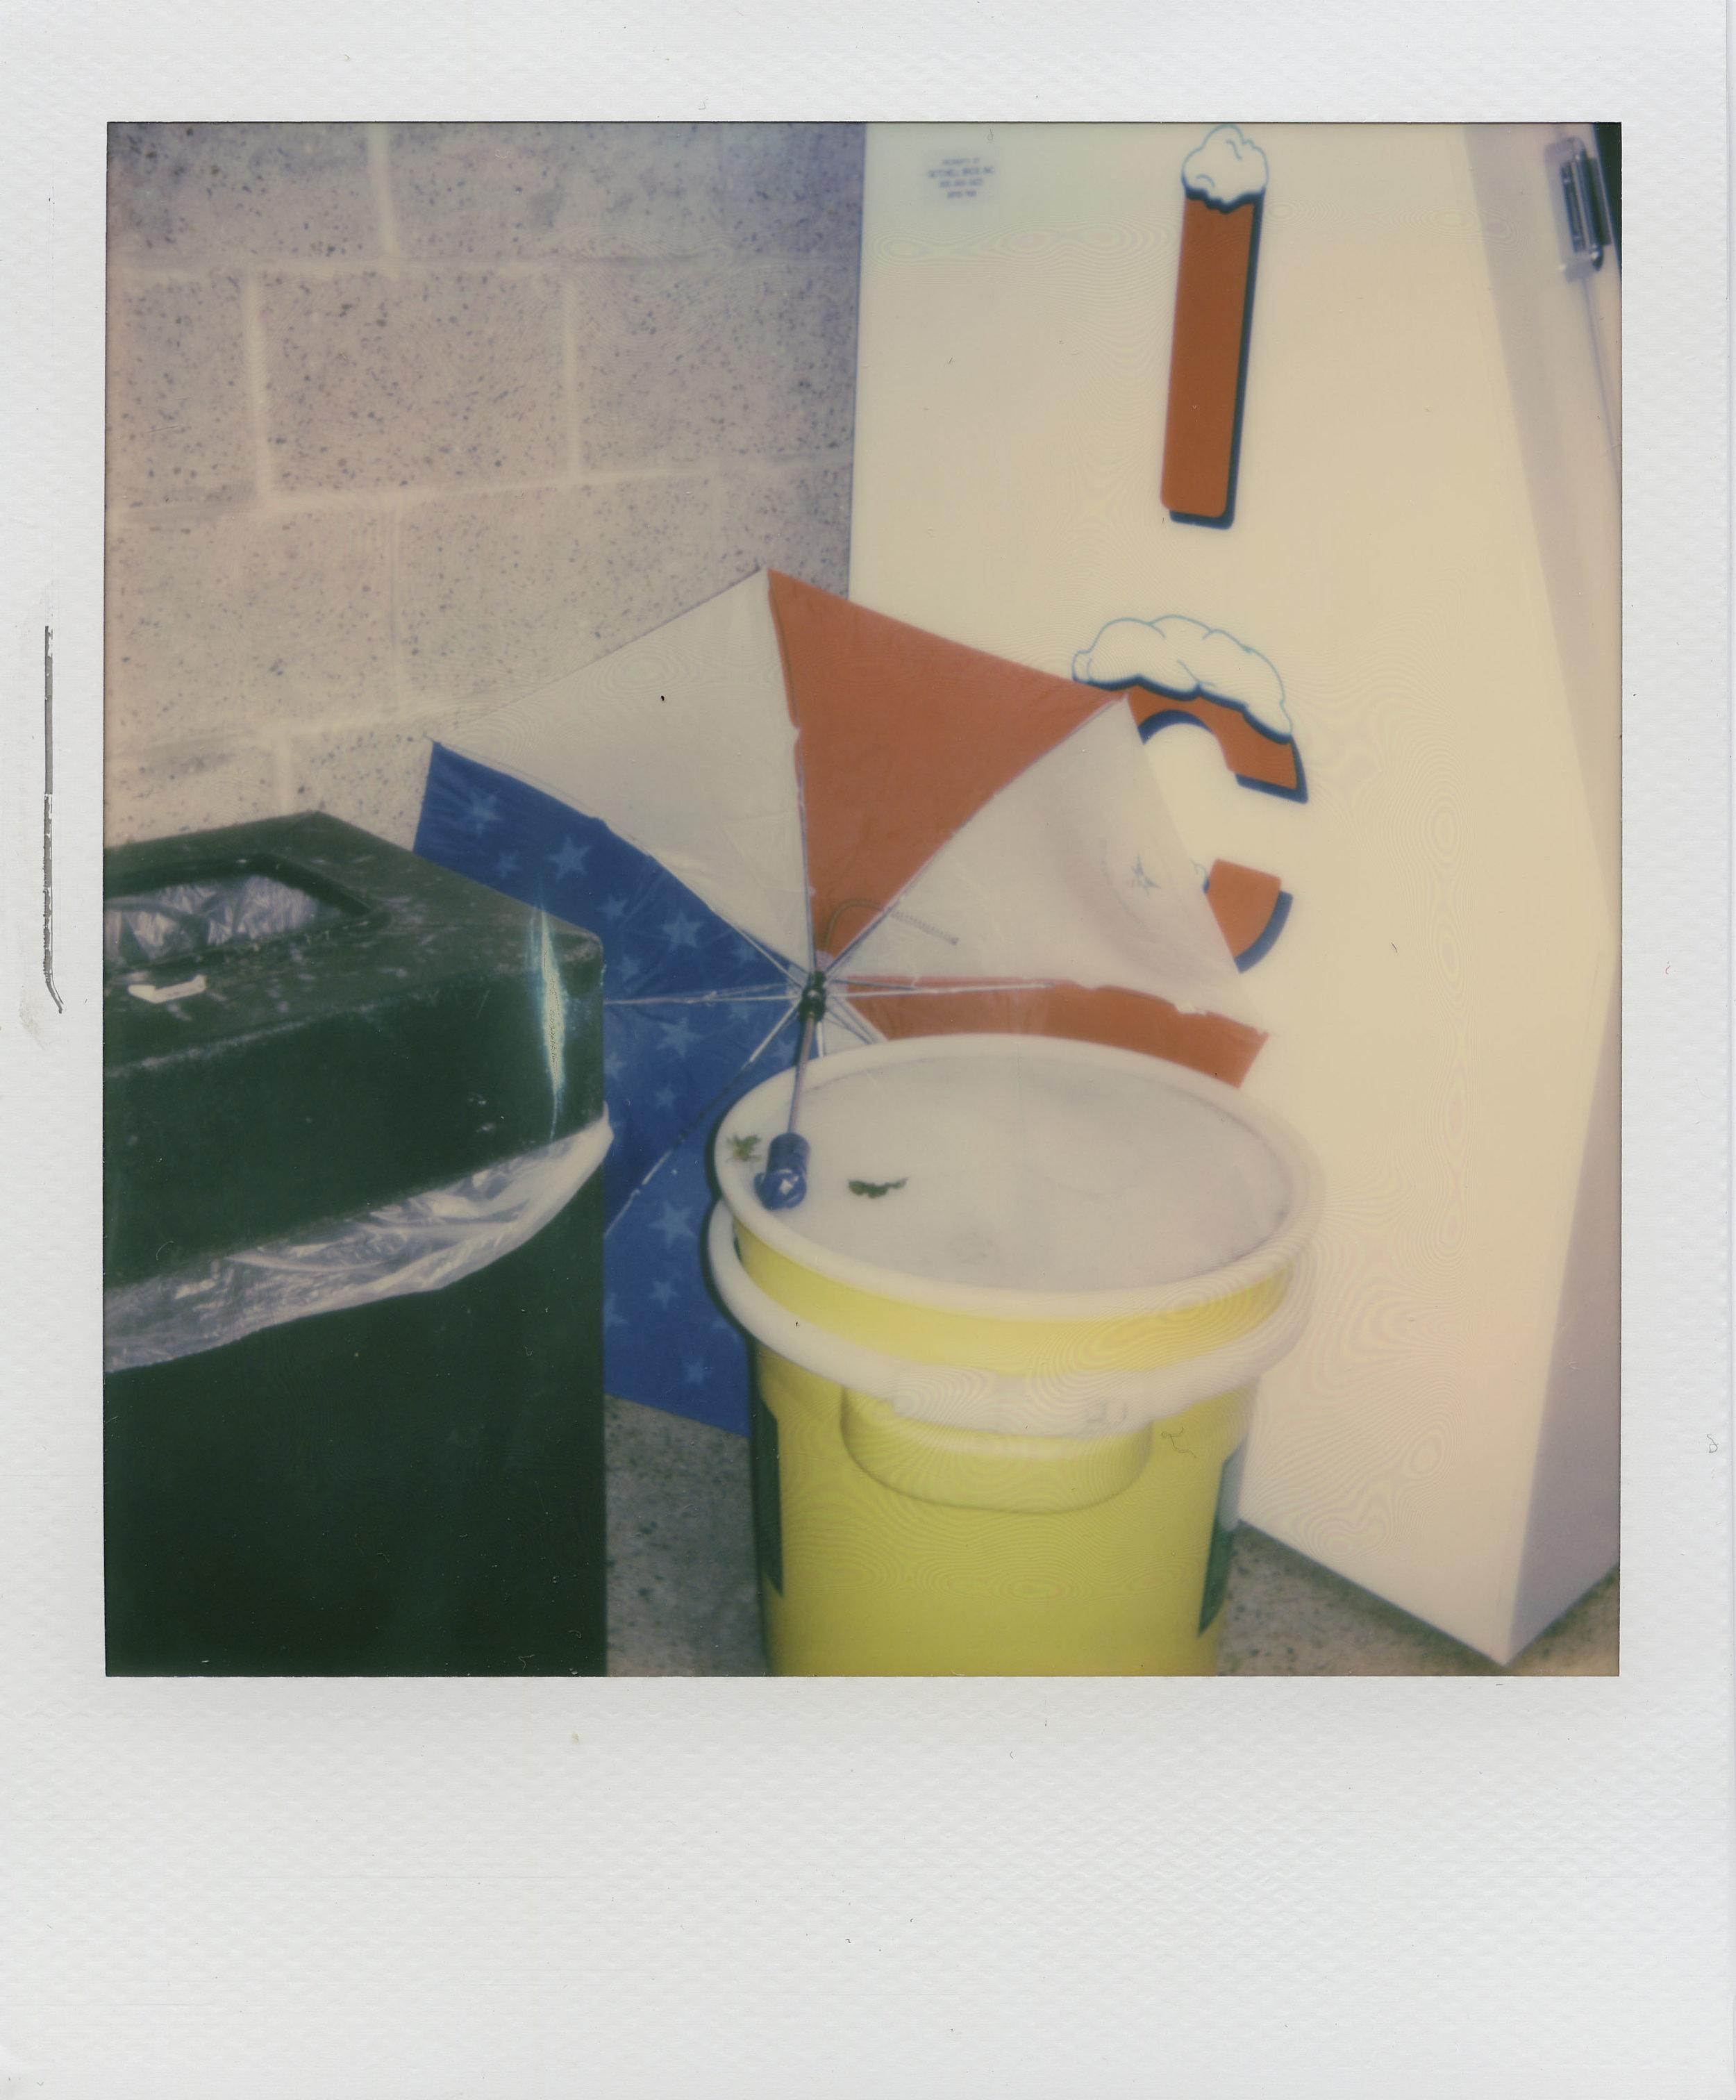 polaroids 3 001.jpg